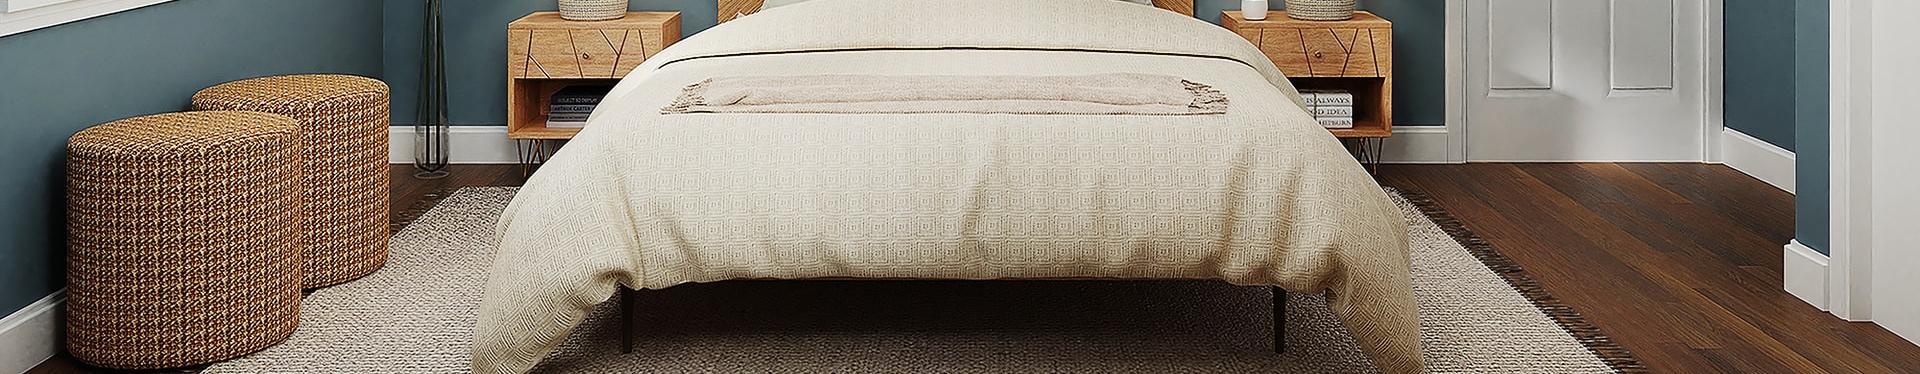 make your own bedbug traps